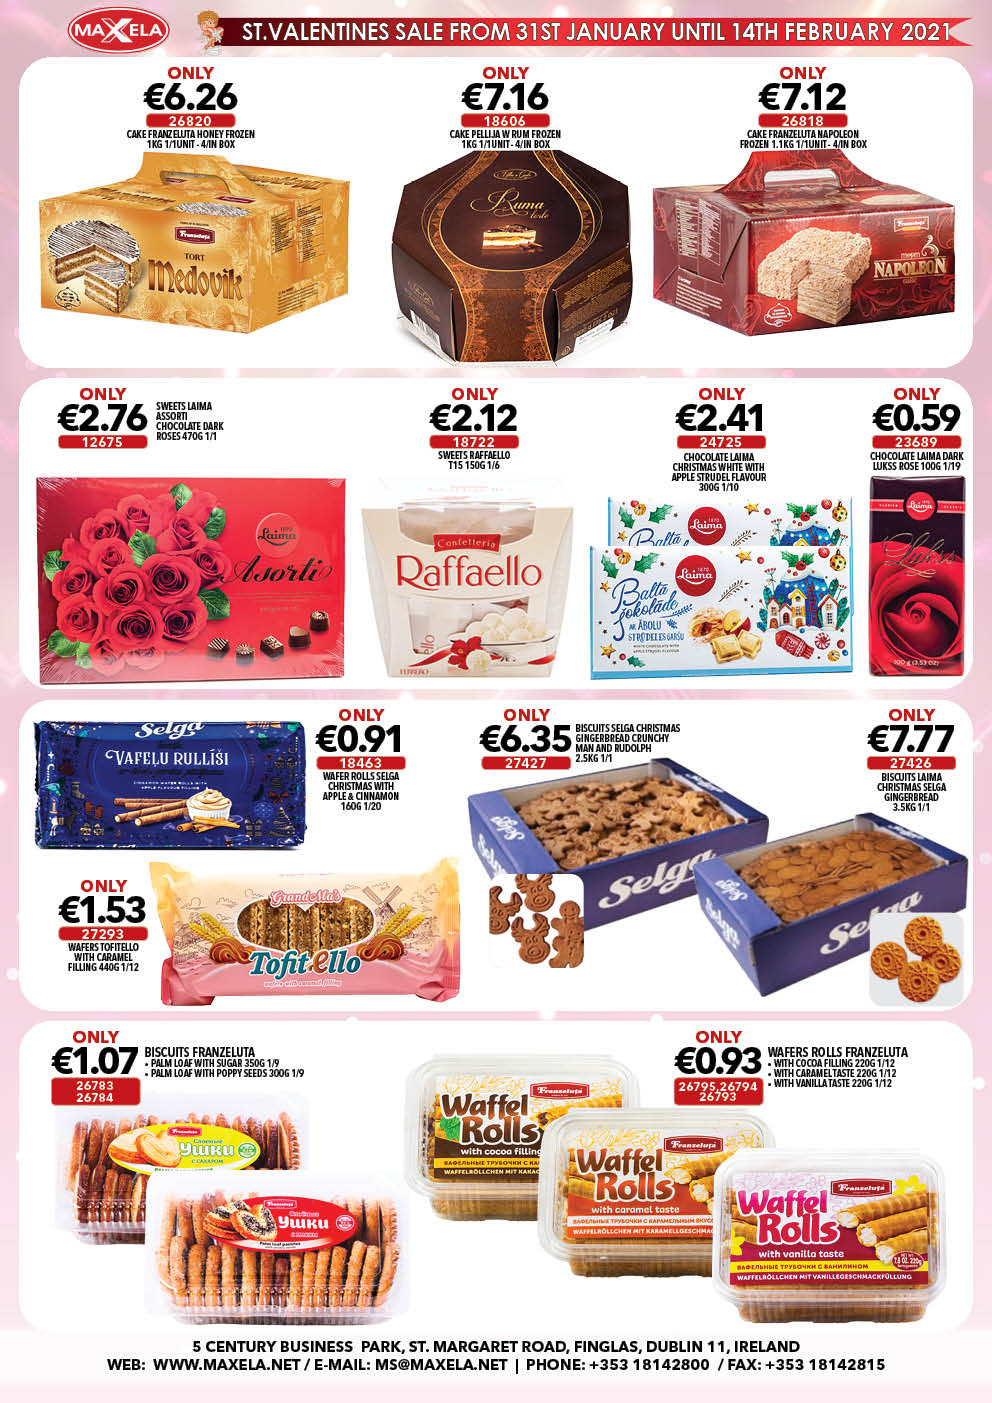 Maxela St.Valentines Sale 2021